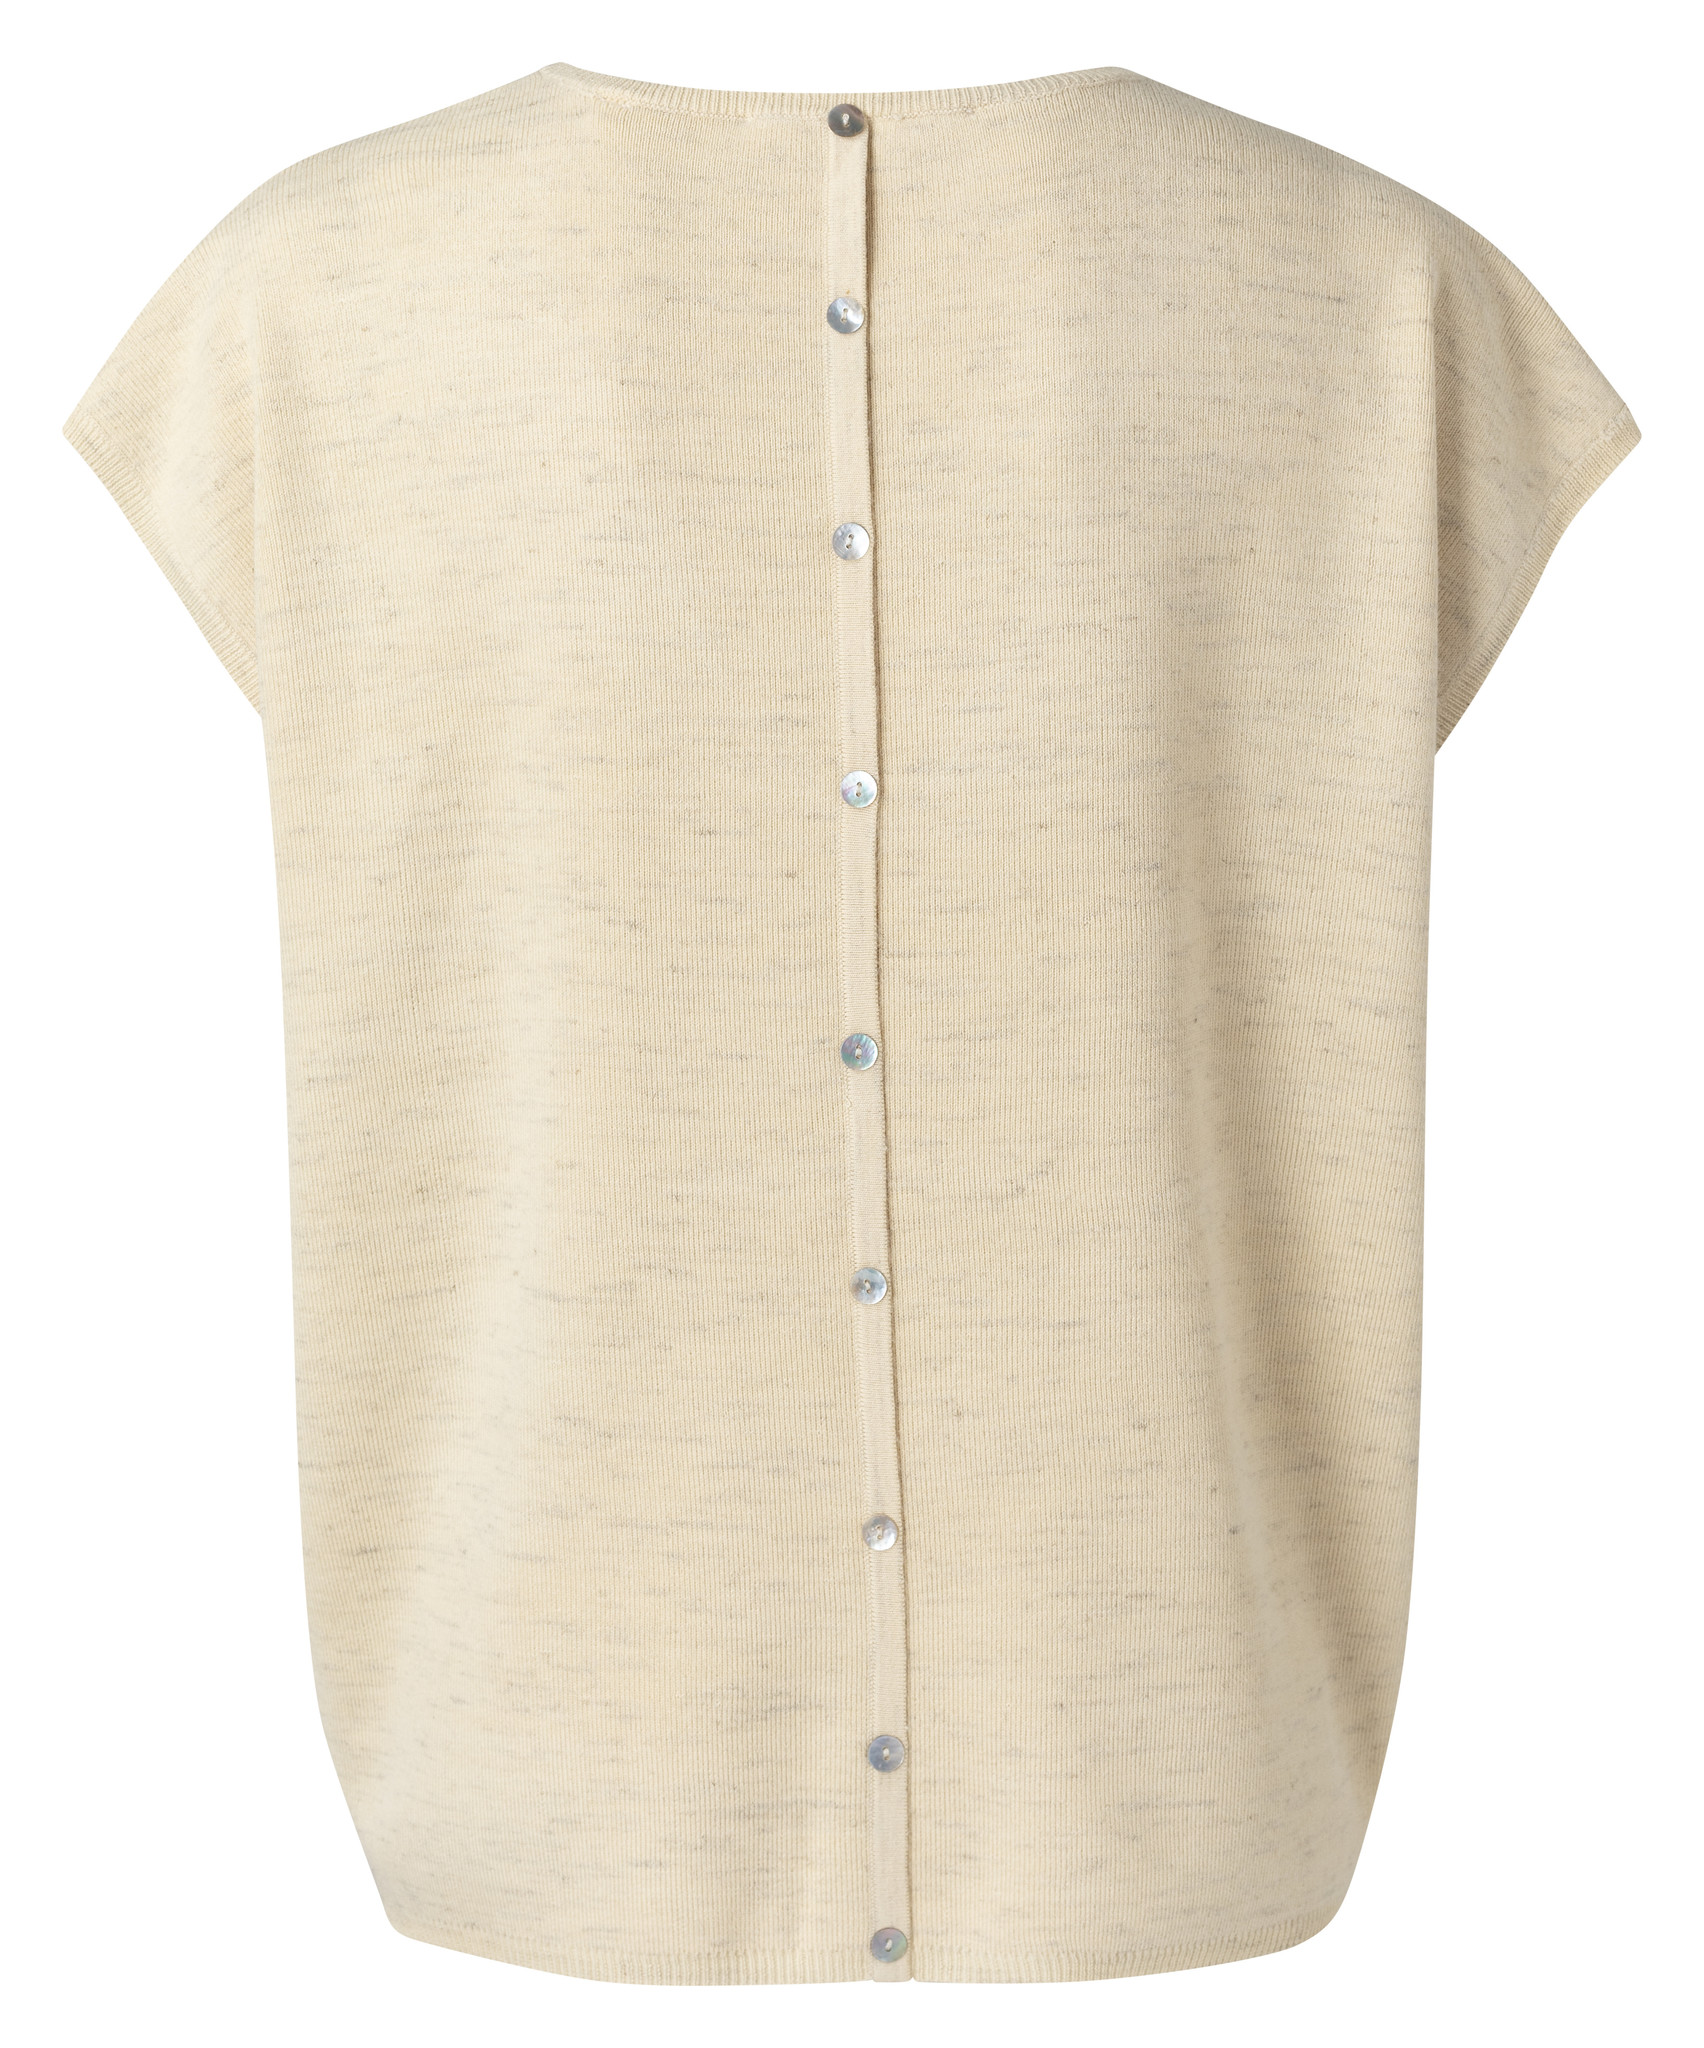 yaya Vneck sweater with b 1000420-113-2